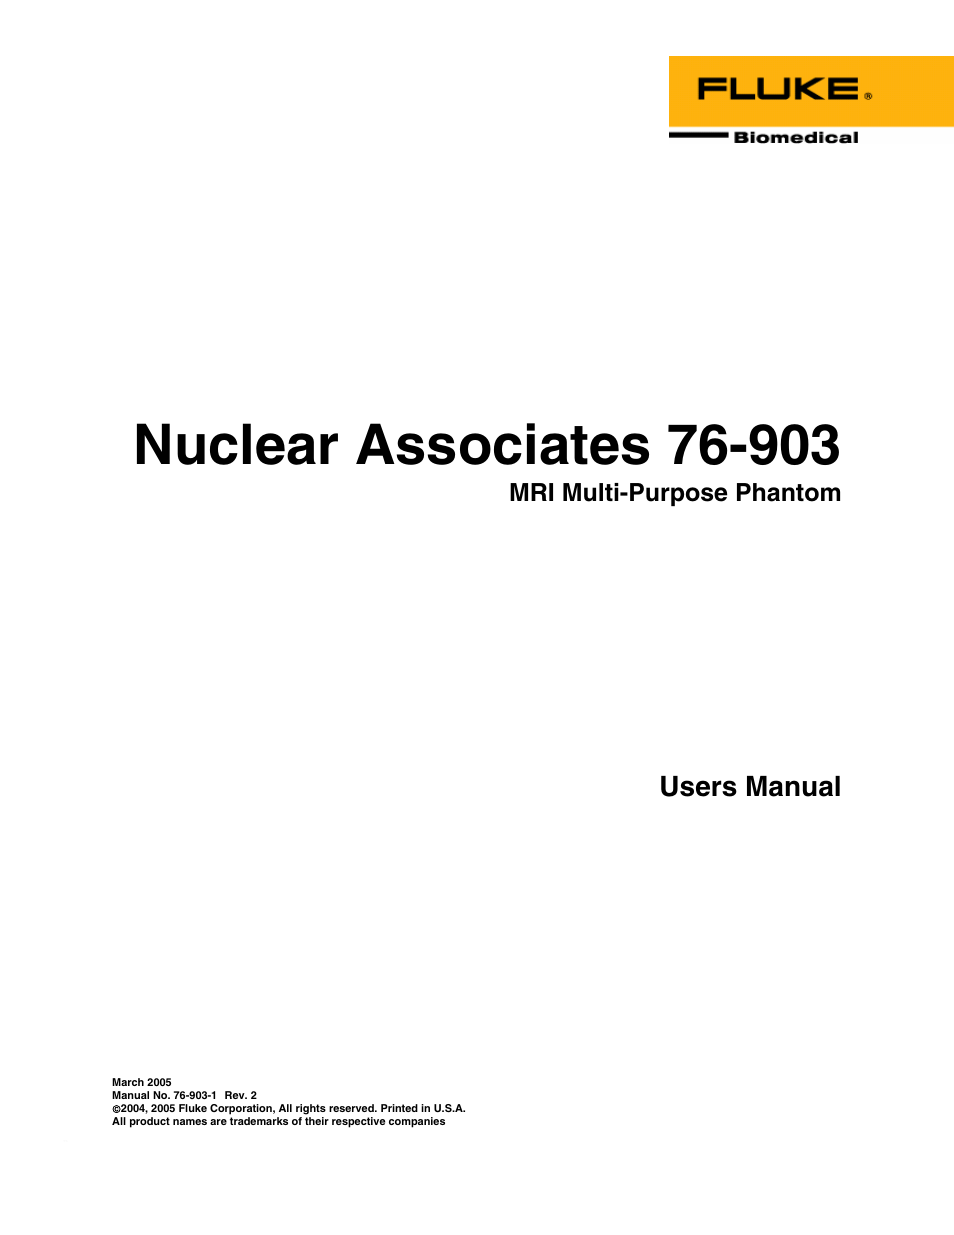 Fluke Biomedical 76-903 User Manual | 16 pages